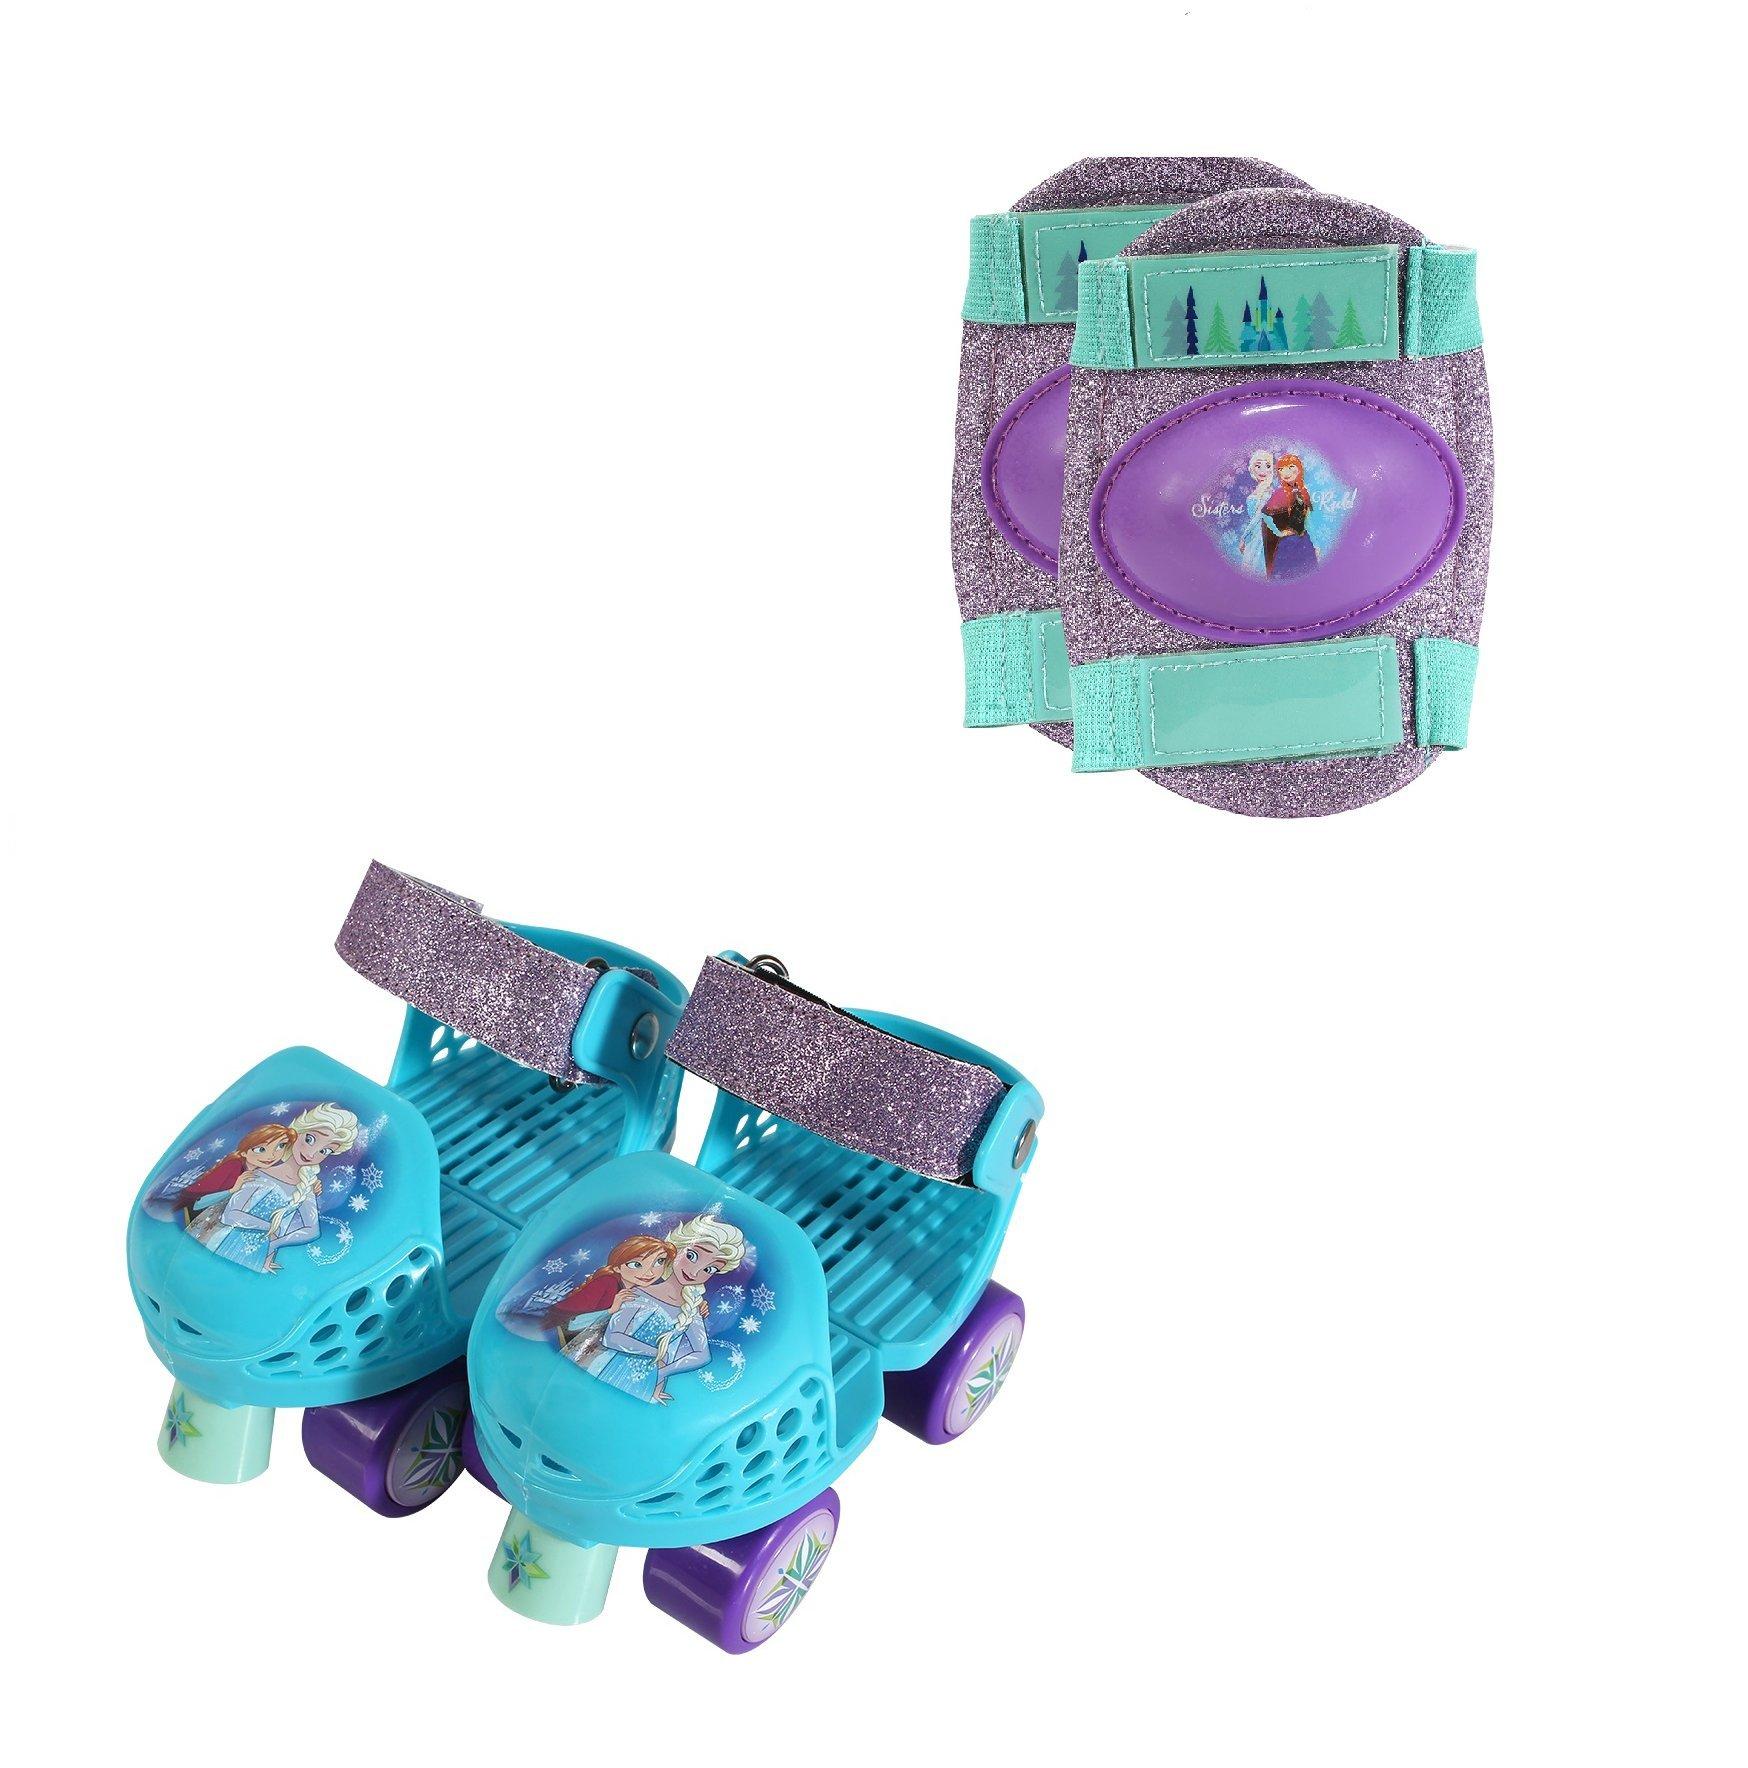 PlayWheels Disney Frozen Kids Glitter Roller Skates with Knee Pads - Childrens Adjustable Skates - Junior Size 6-12 by PlayWheels